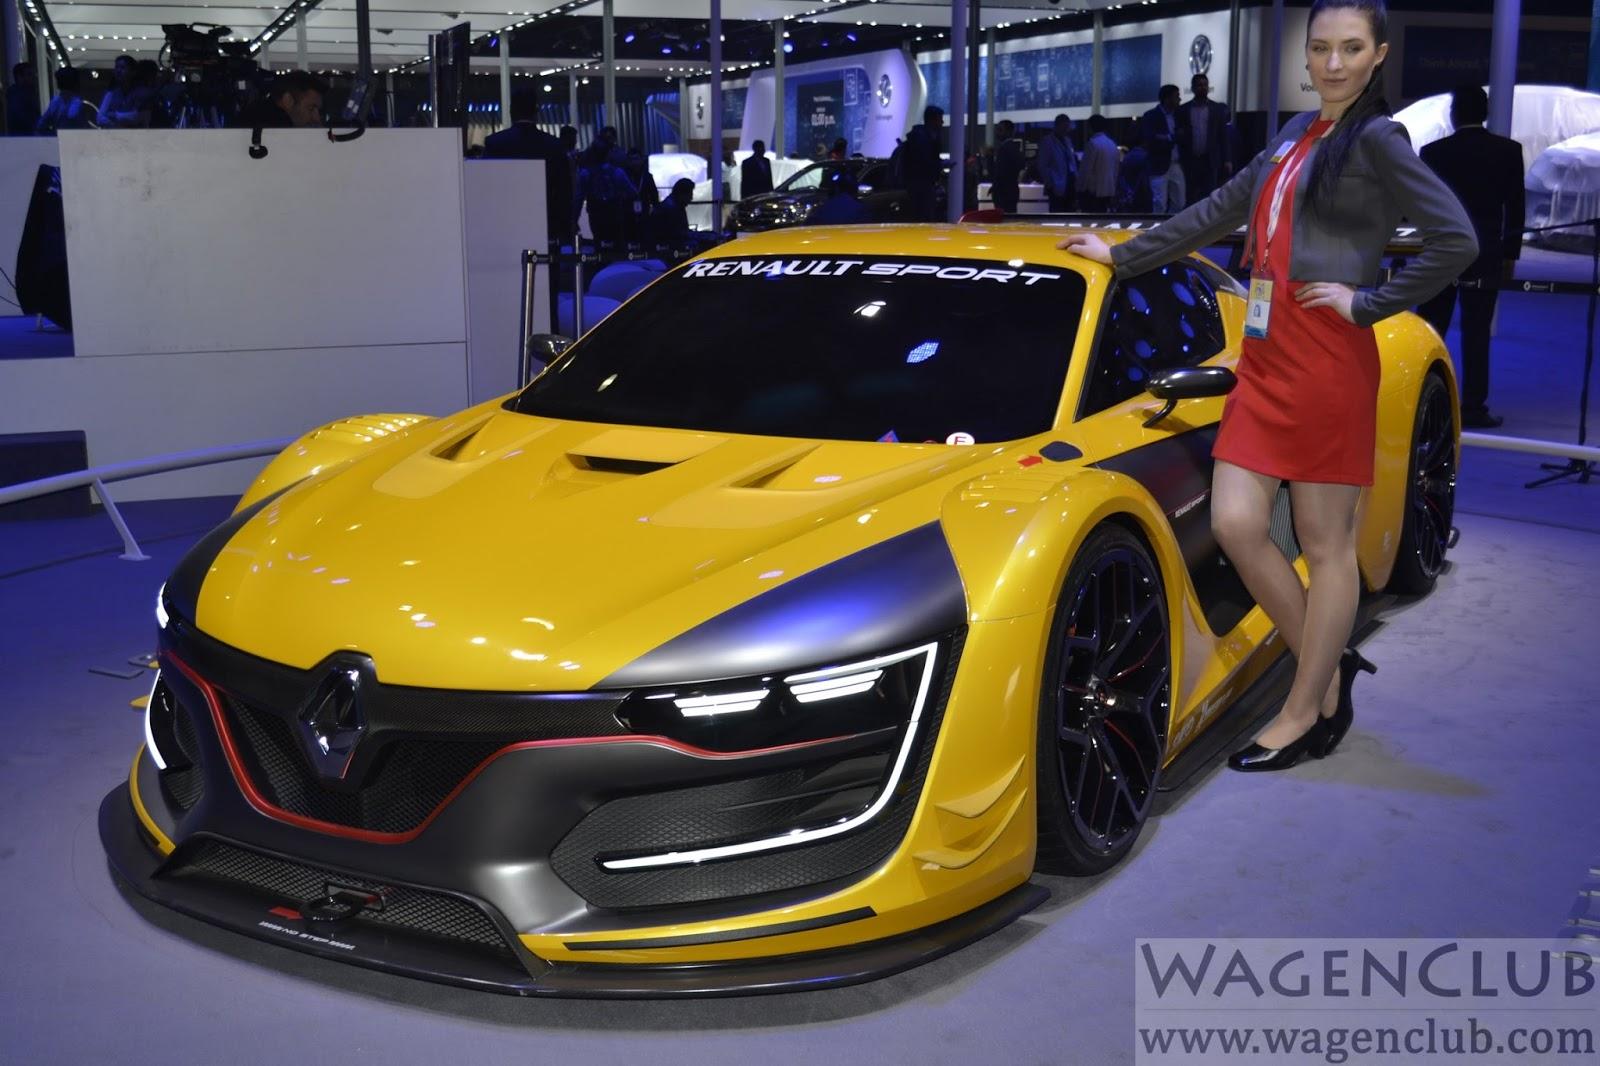 2016 Delhi Auto Expo Top 10 Concept Cars: Renault Sport RS 01 GT Racer